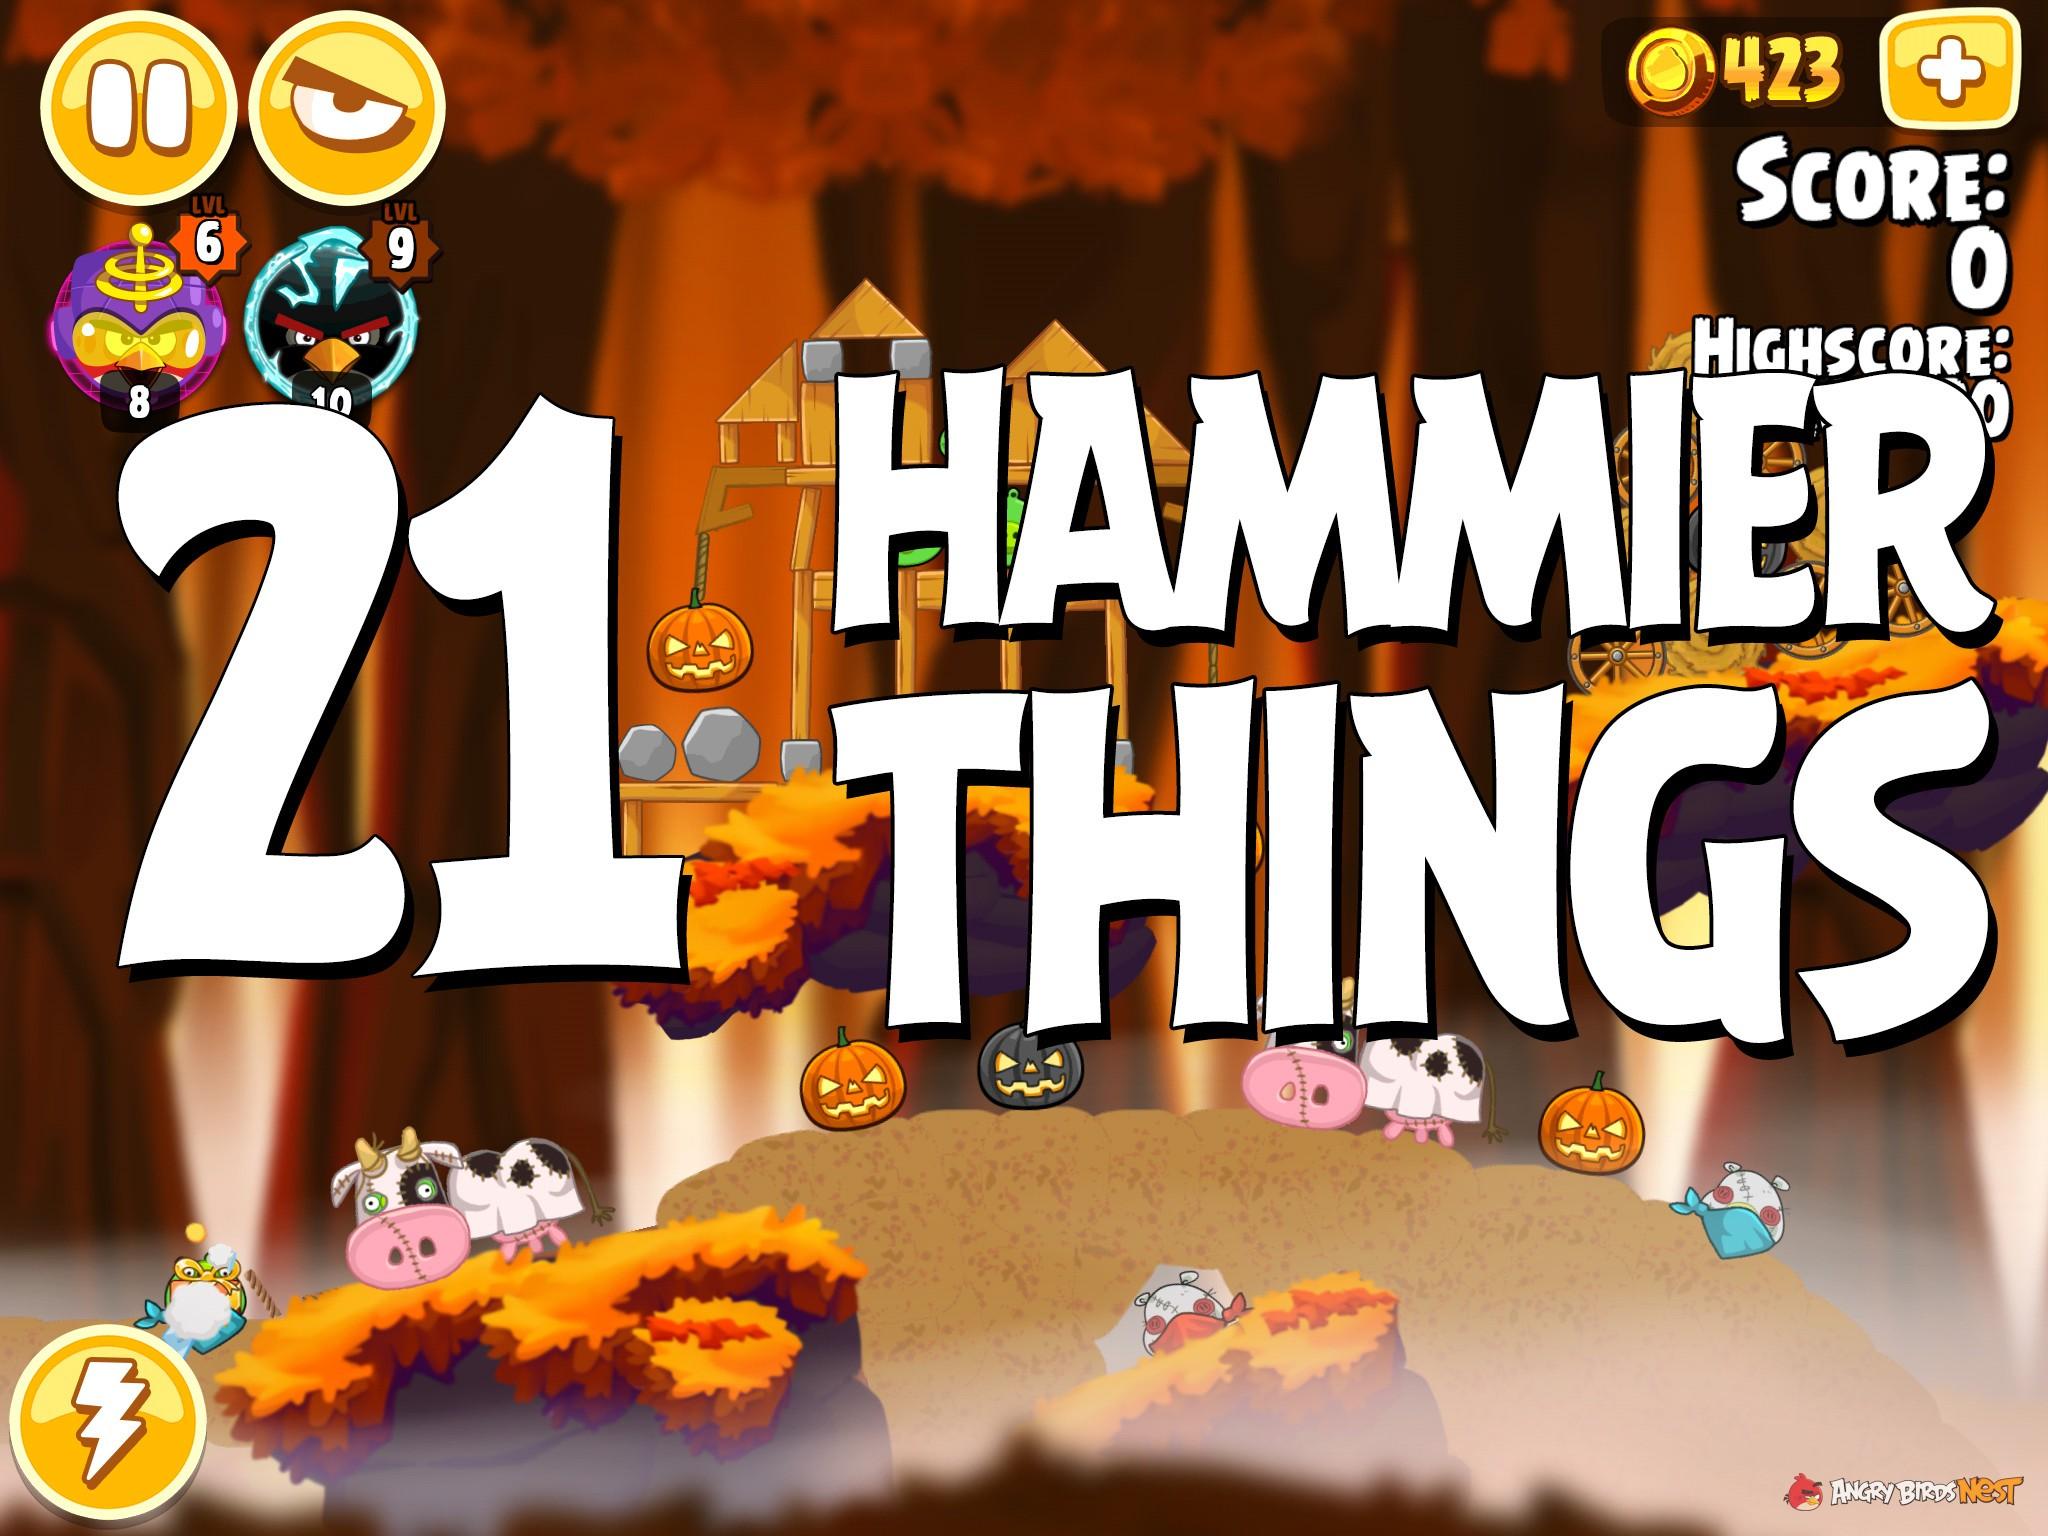 Angry Birds Hammier Things angry birds seasons hammier things level 1-21 walkthrough